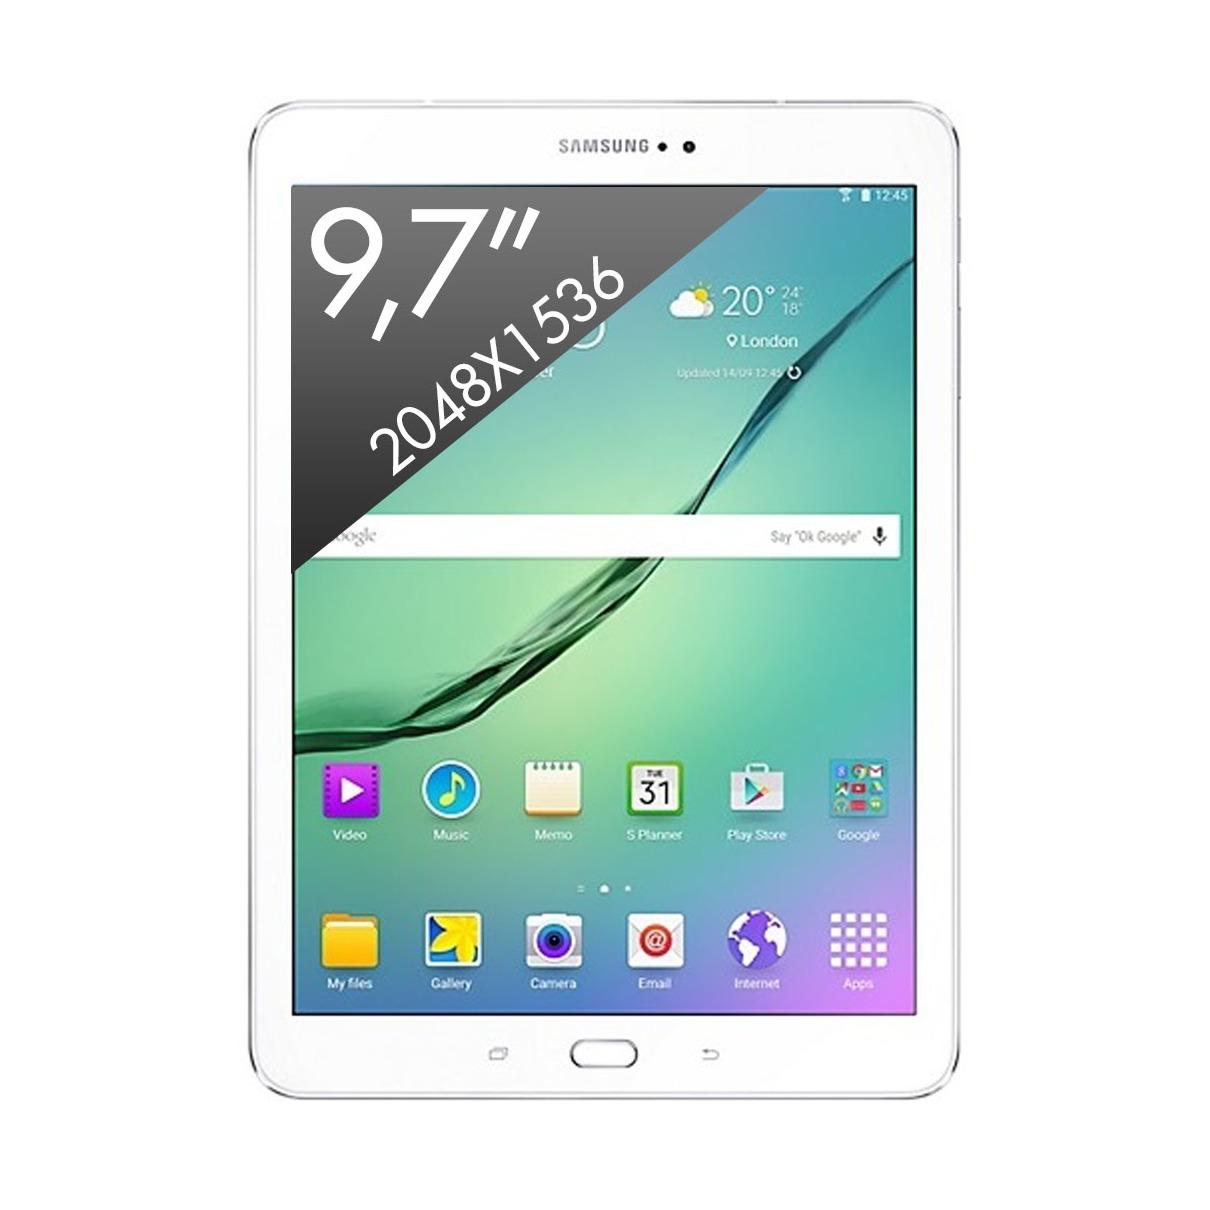 Telefoonleader - Samsung Galaxy Tab S2 9.7 VE (2016) wit